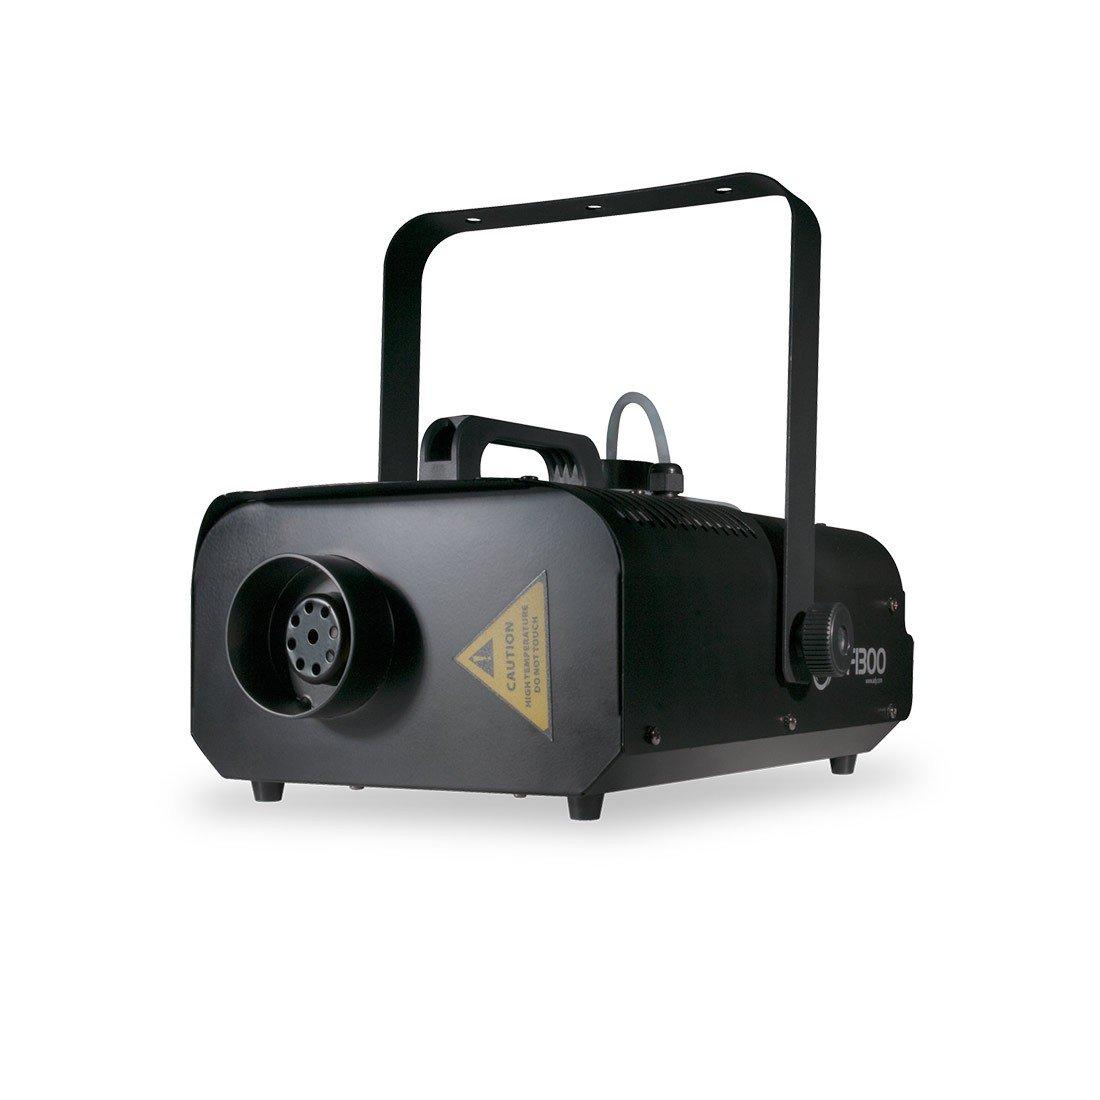 American DJ 1300 Watt 2.3 L Tank Mobile Fog Machine w/ Remote Controls   VF1300